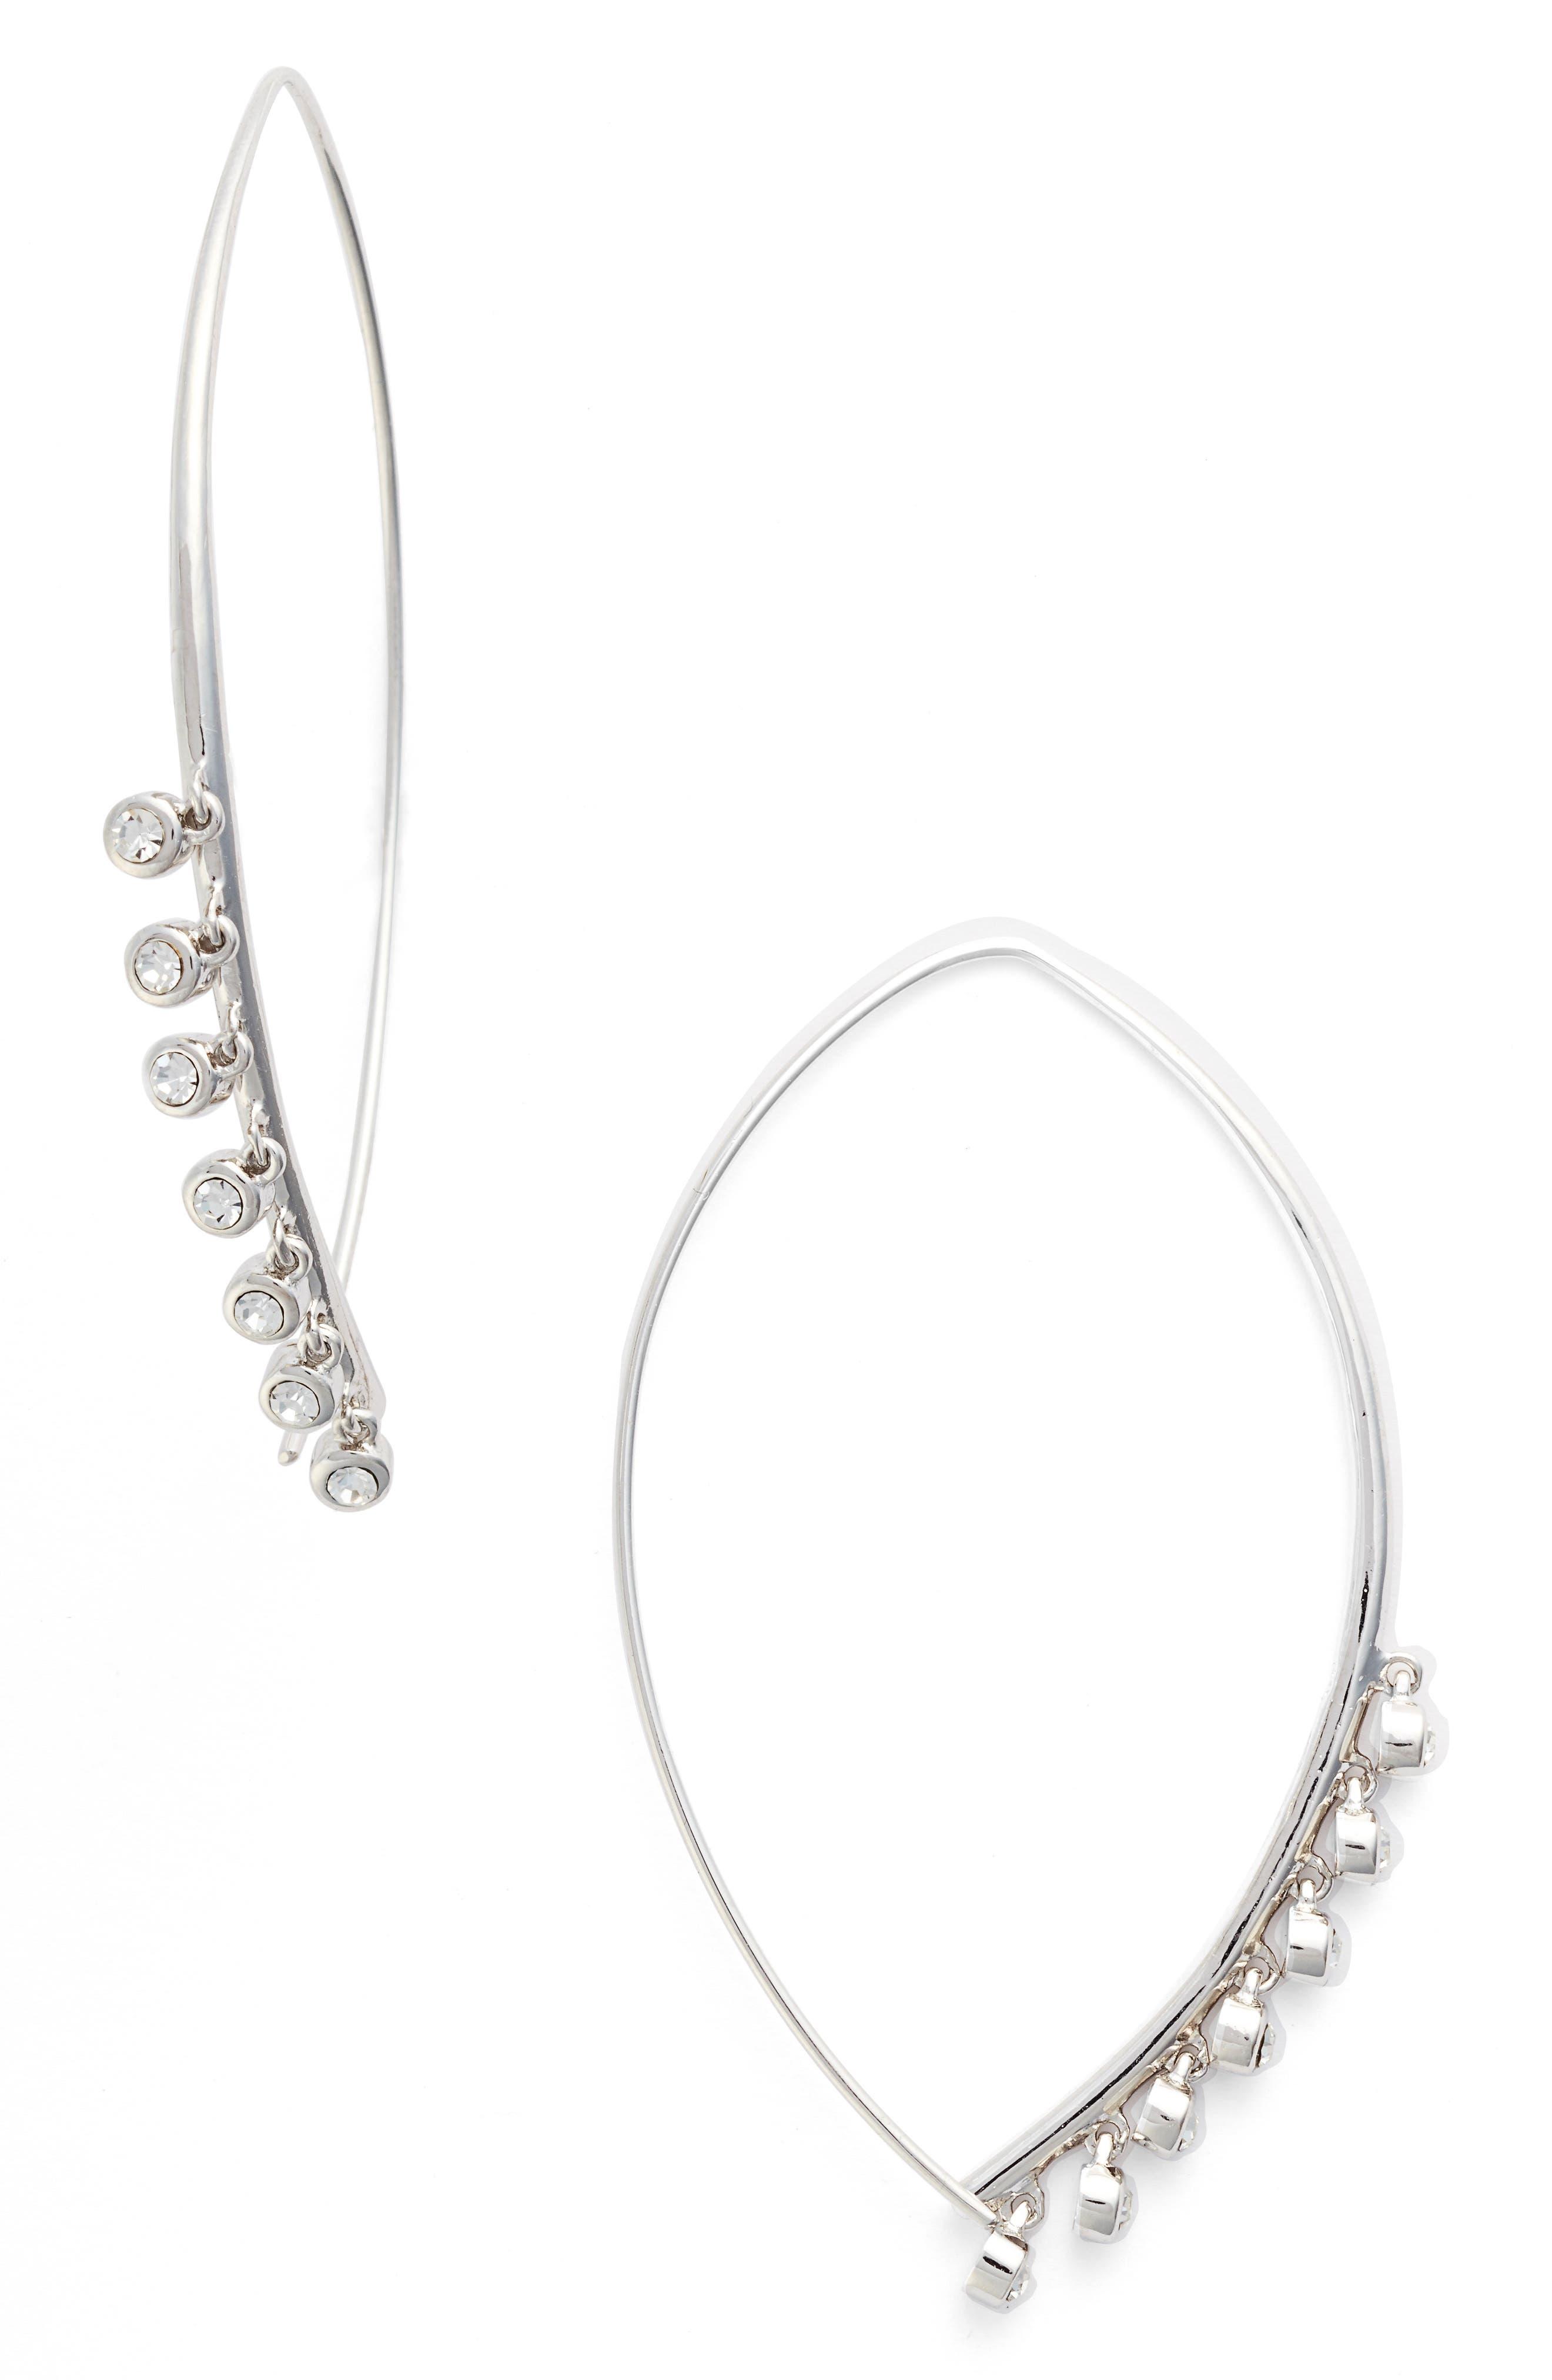 Lure Threader Earrings,                             Main thumbnail 1, color,                             040